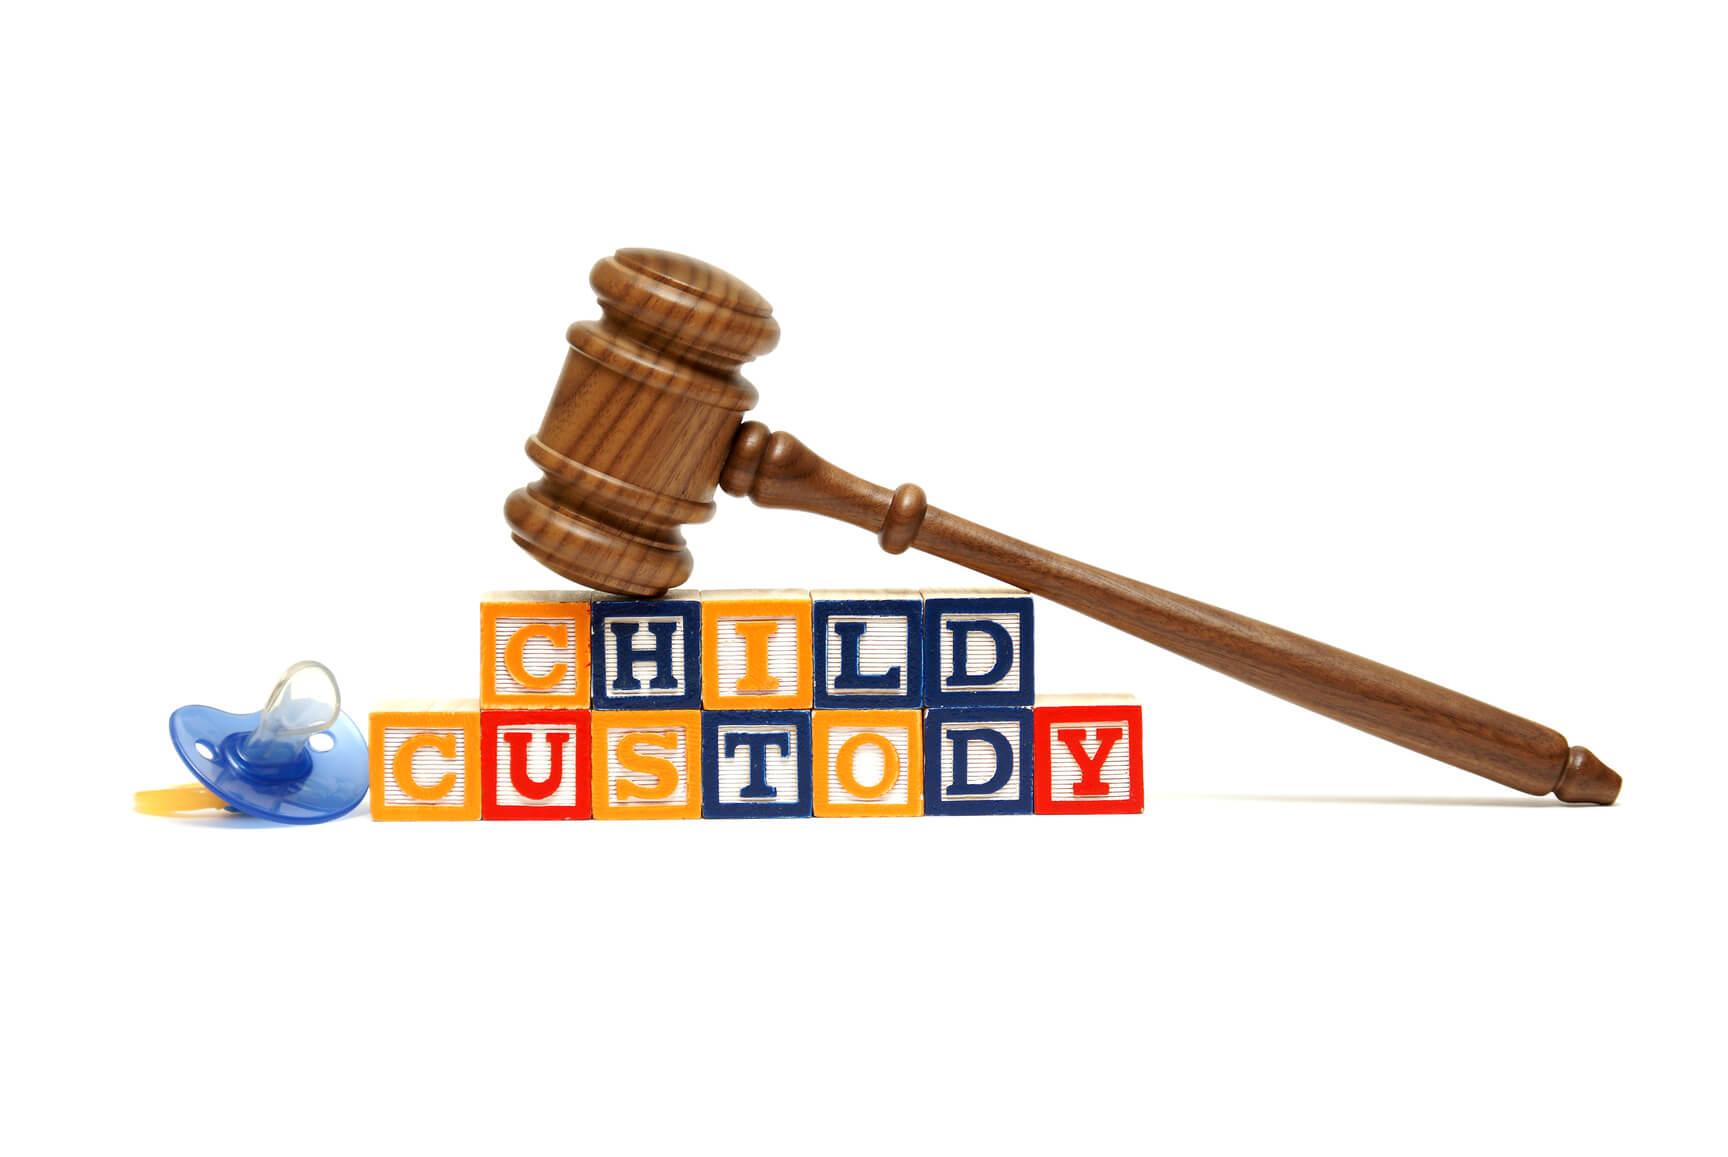 How Child Custody Works